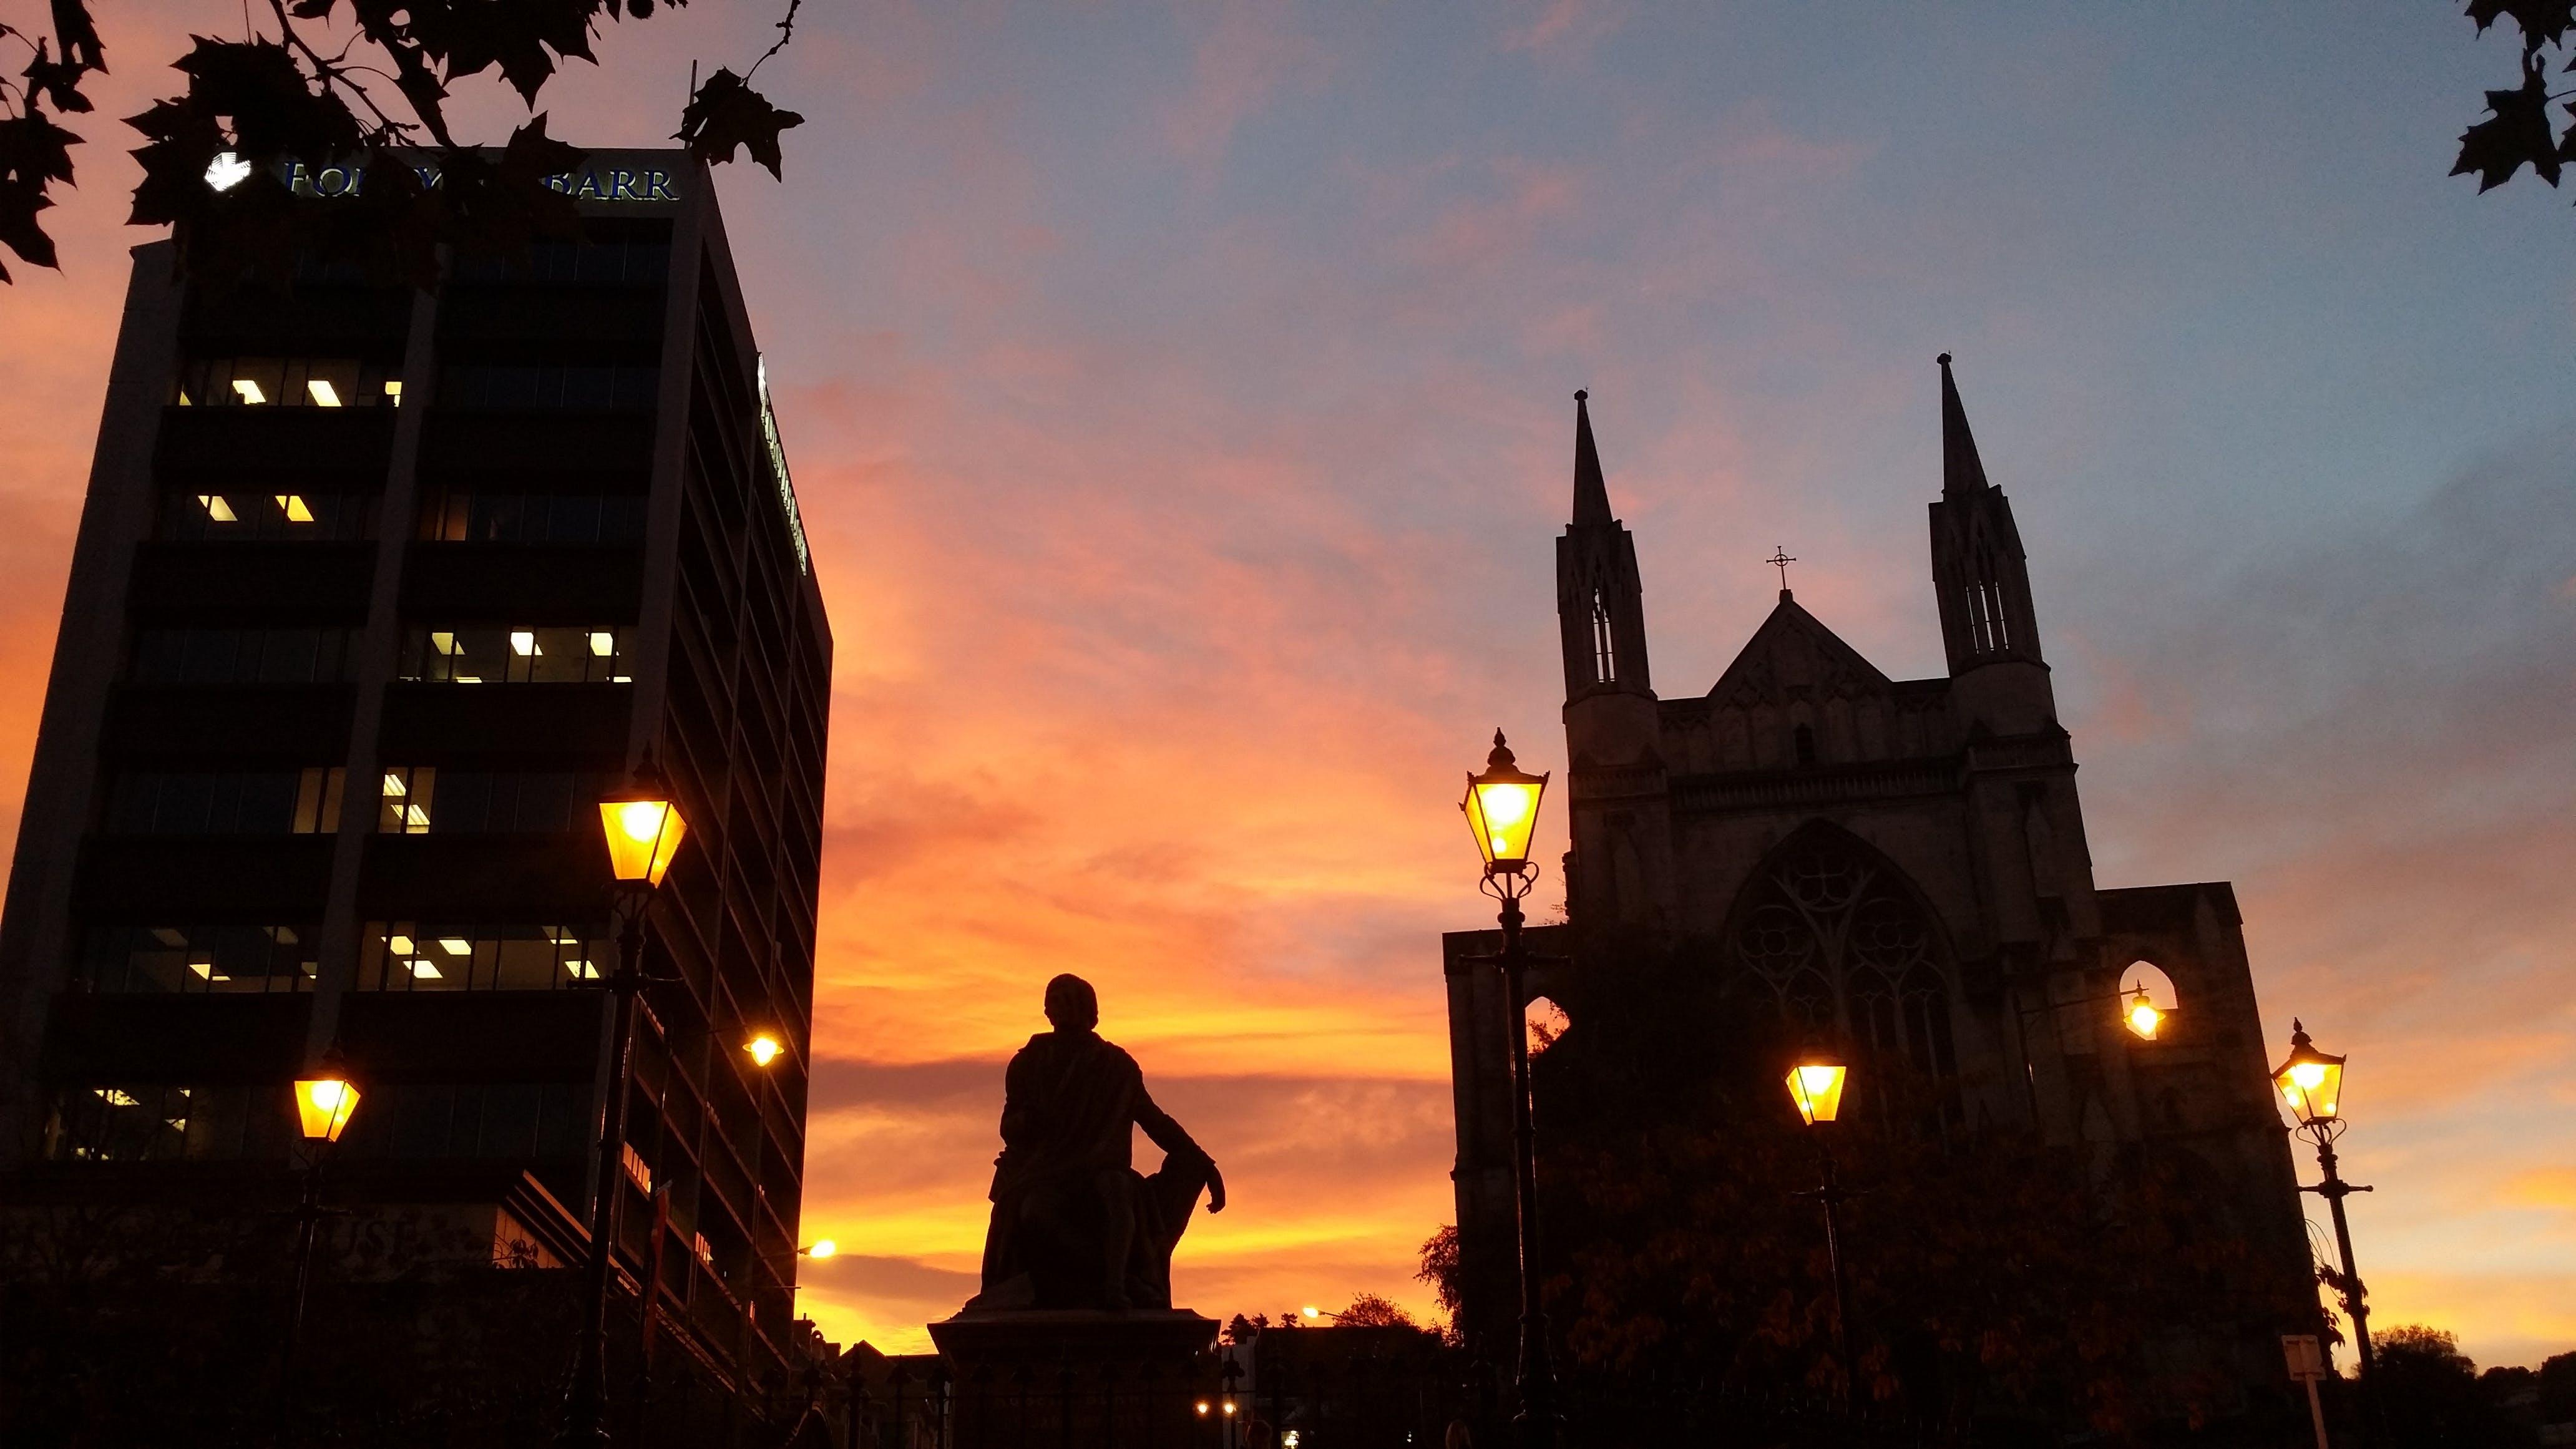 Free stock photo of architecture, evening sky, golden sun, new zealand